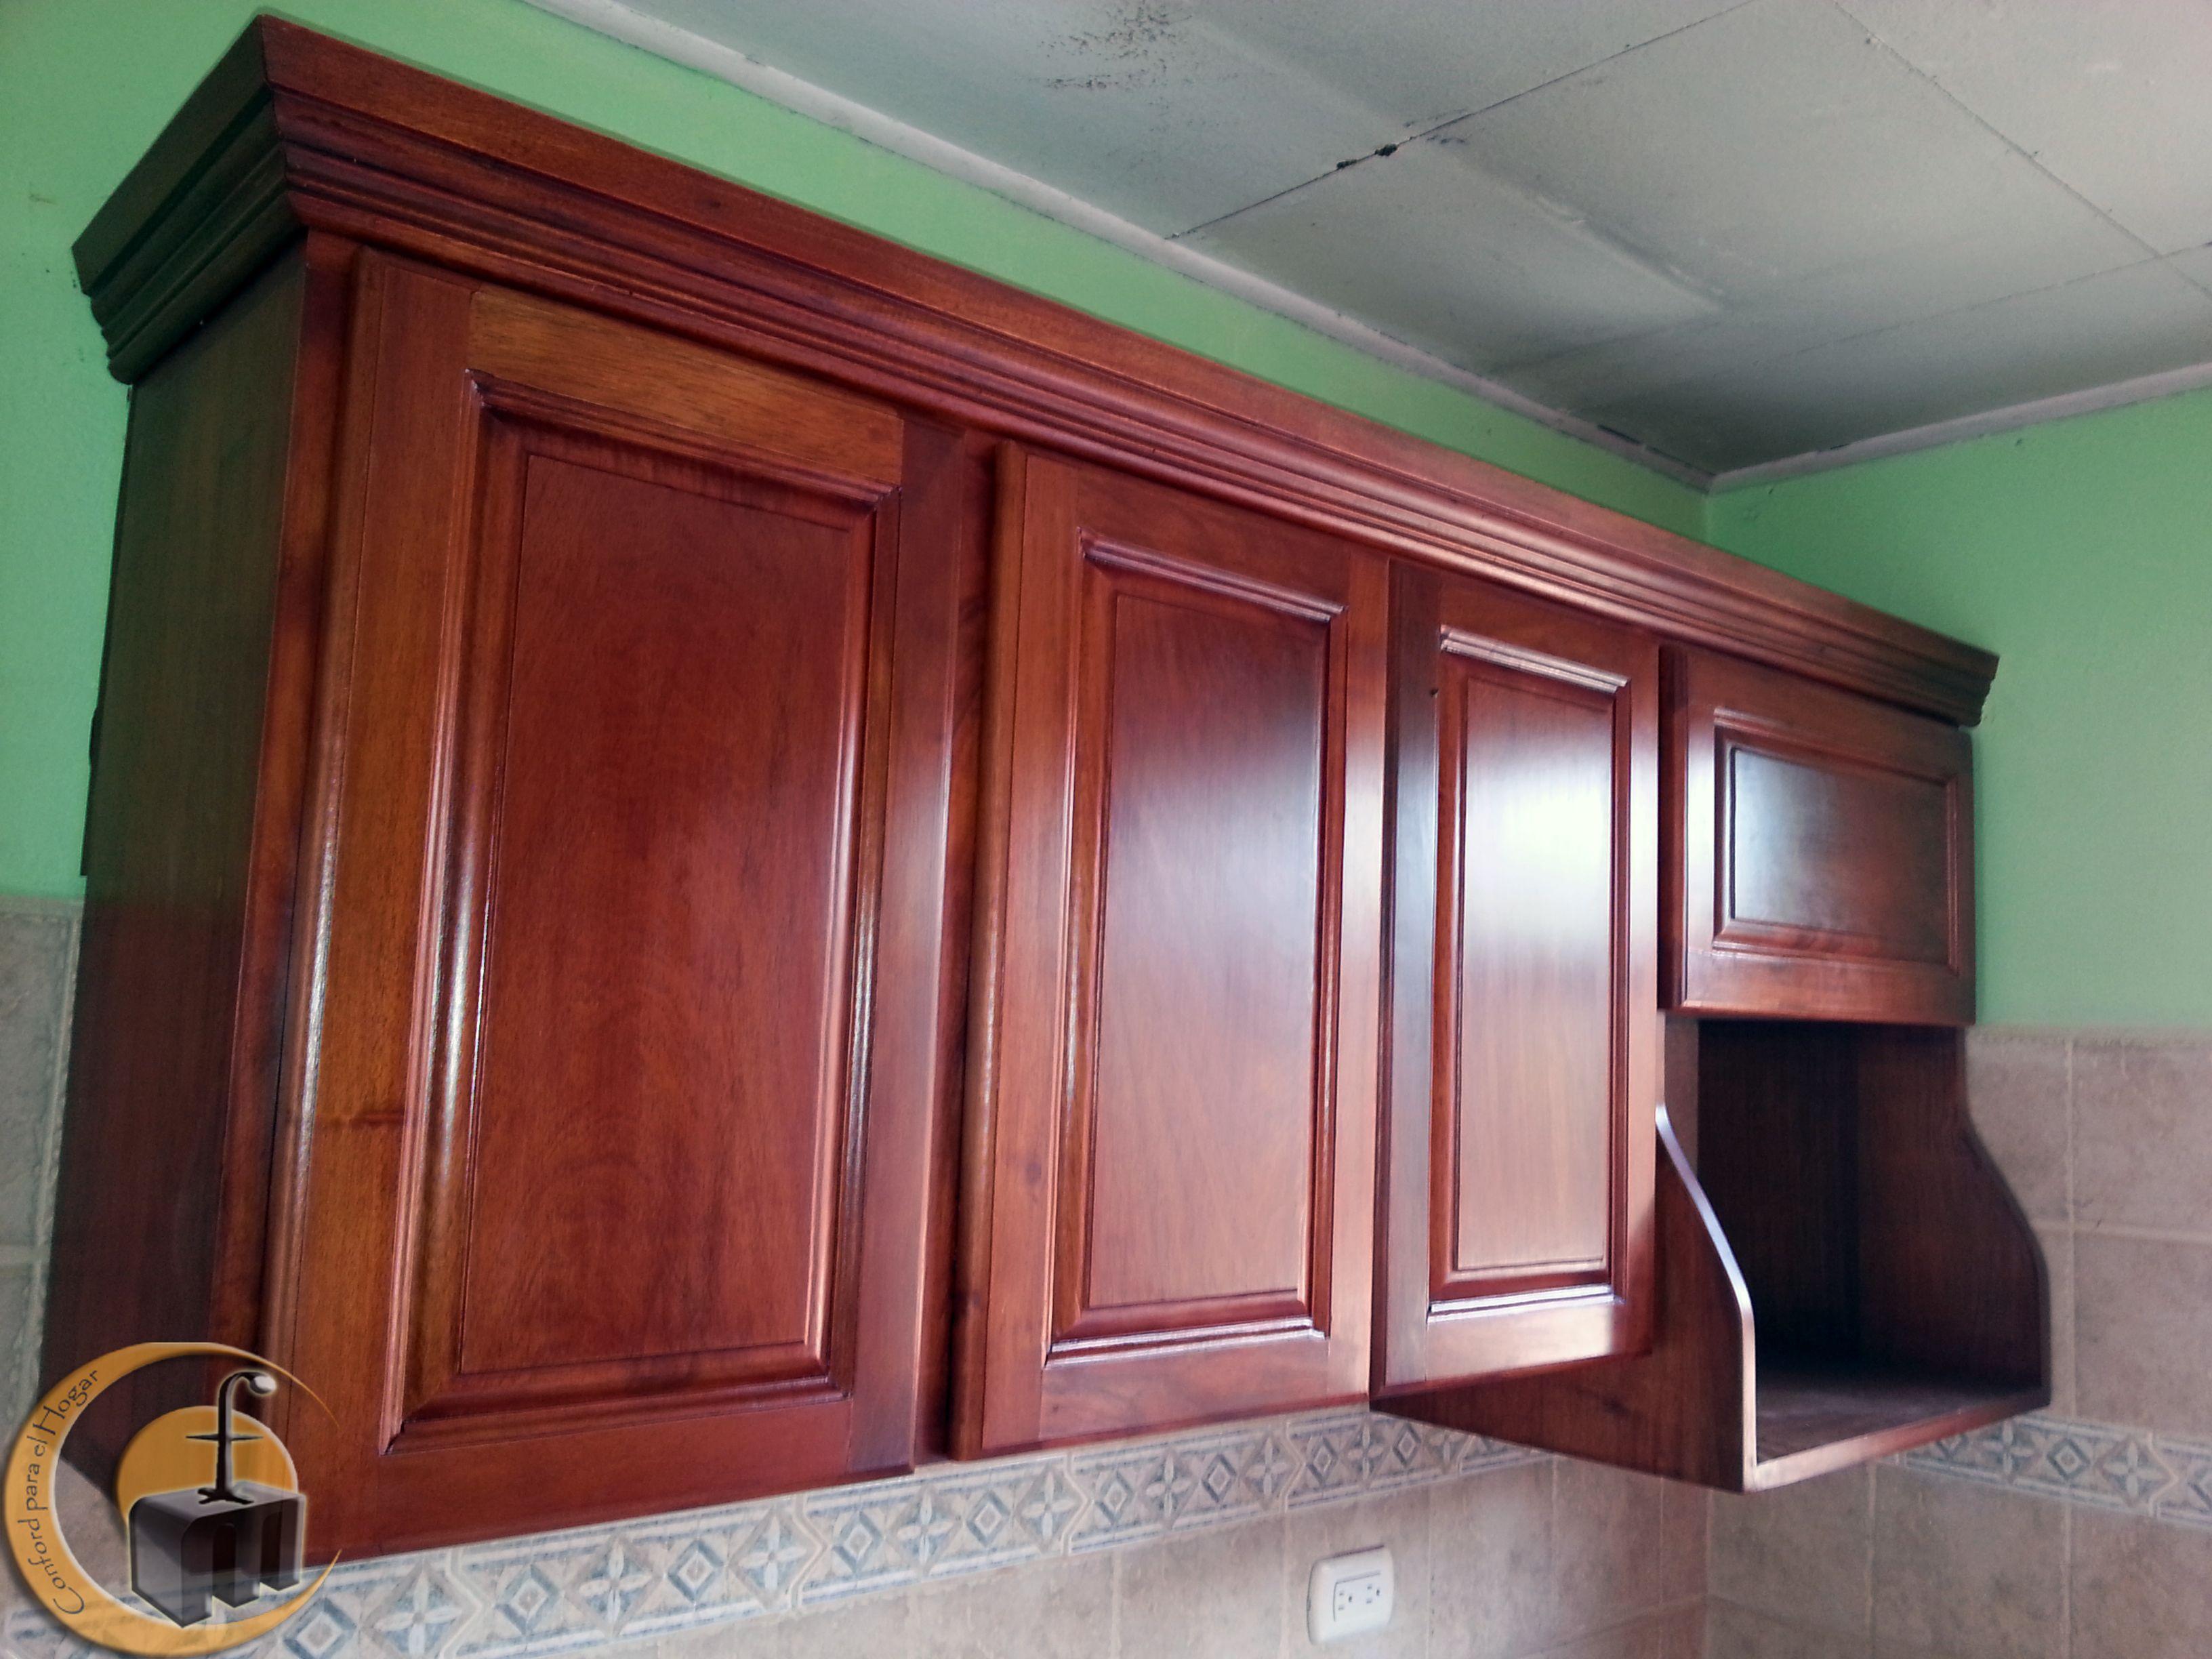 Cocina de madera cedro, m u00f3dulo a u00e9reo con mueble para microondas